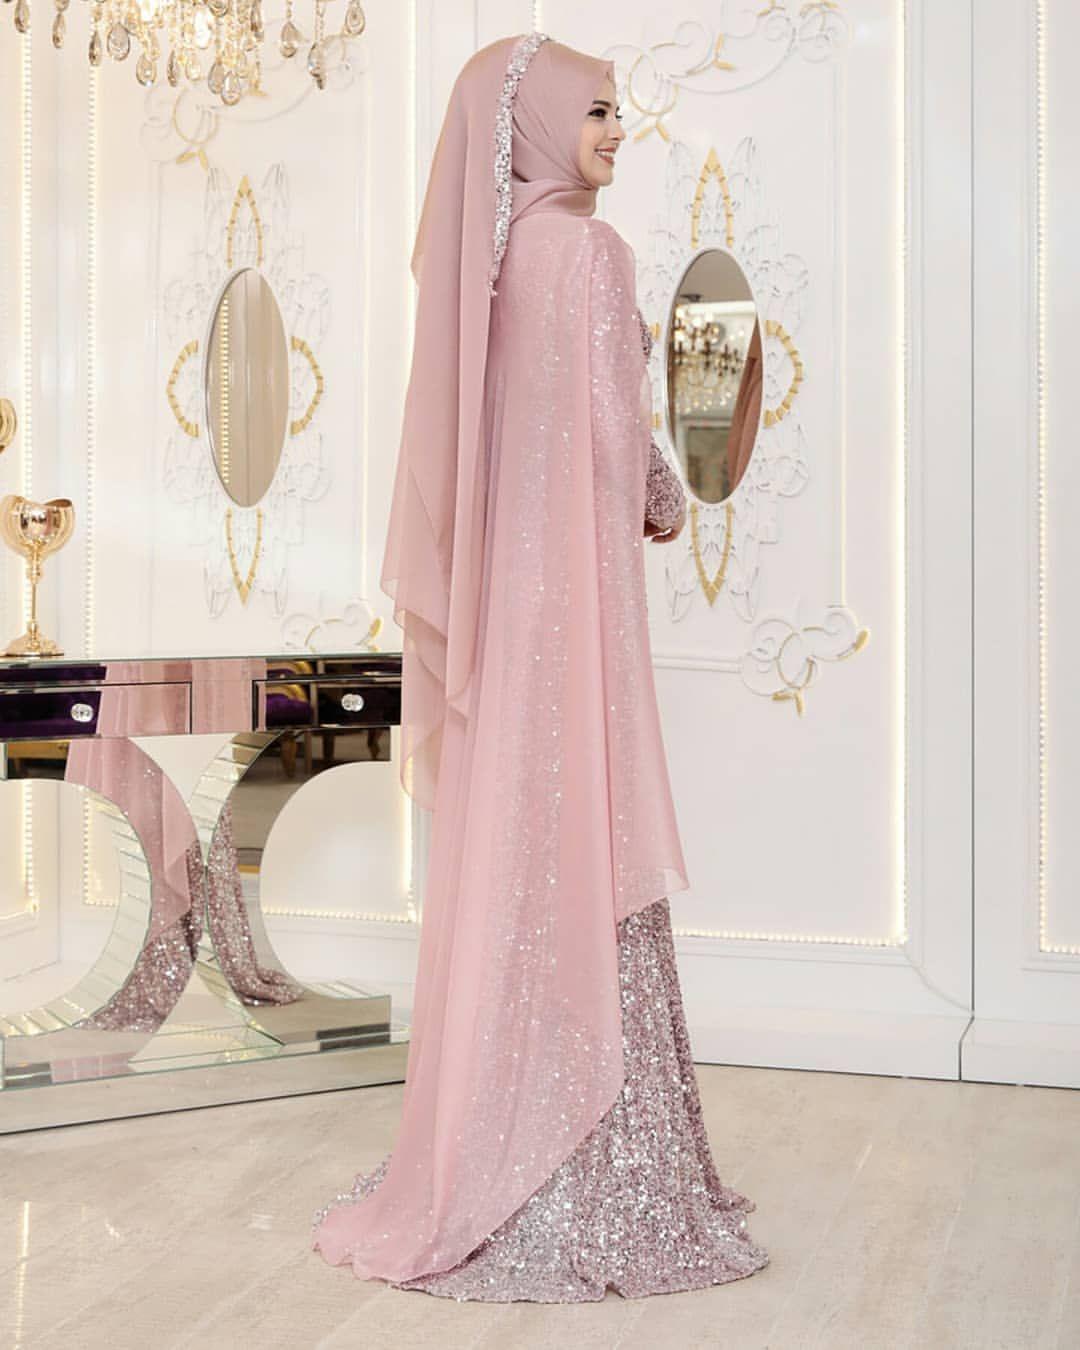 "Photo of #pınarşems. sales on Instagram: ""It can be used without a cape !! 🌸Pınar Şems, 🌸Gleneneni Evening Dress 🌸ekru, purple, navy blue, powder, gold Size: 36-38-40-42-44-46 Price: 985 tl. 💁 … """